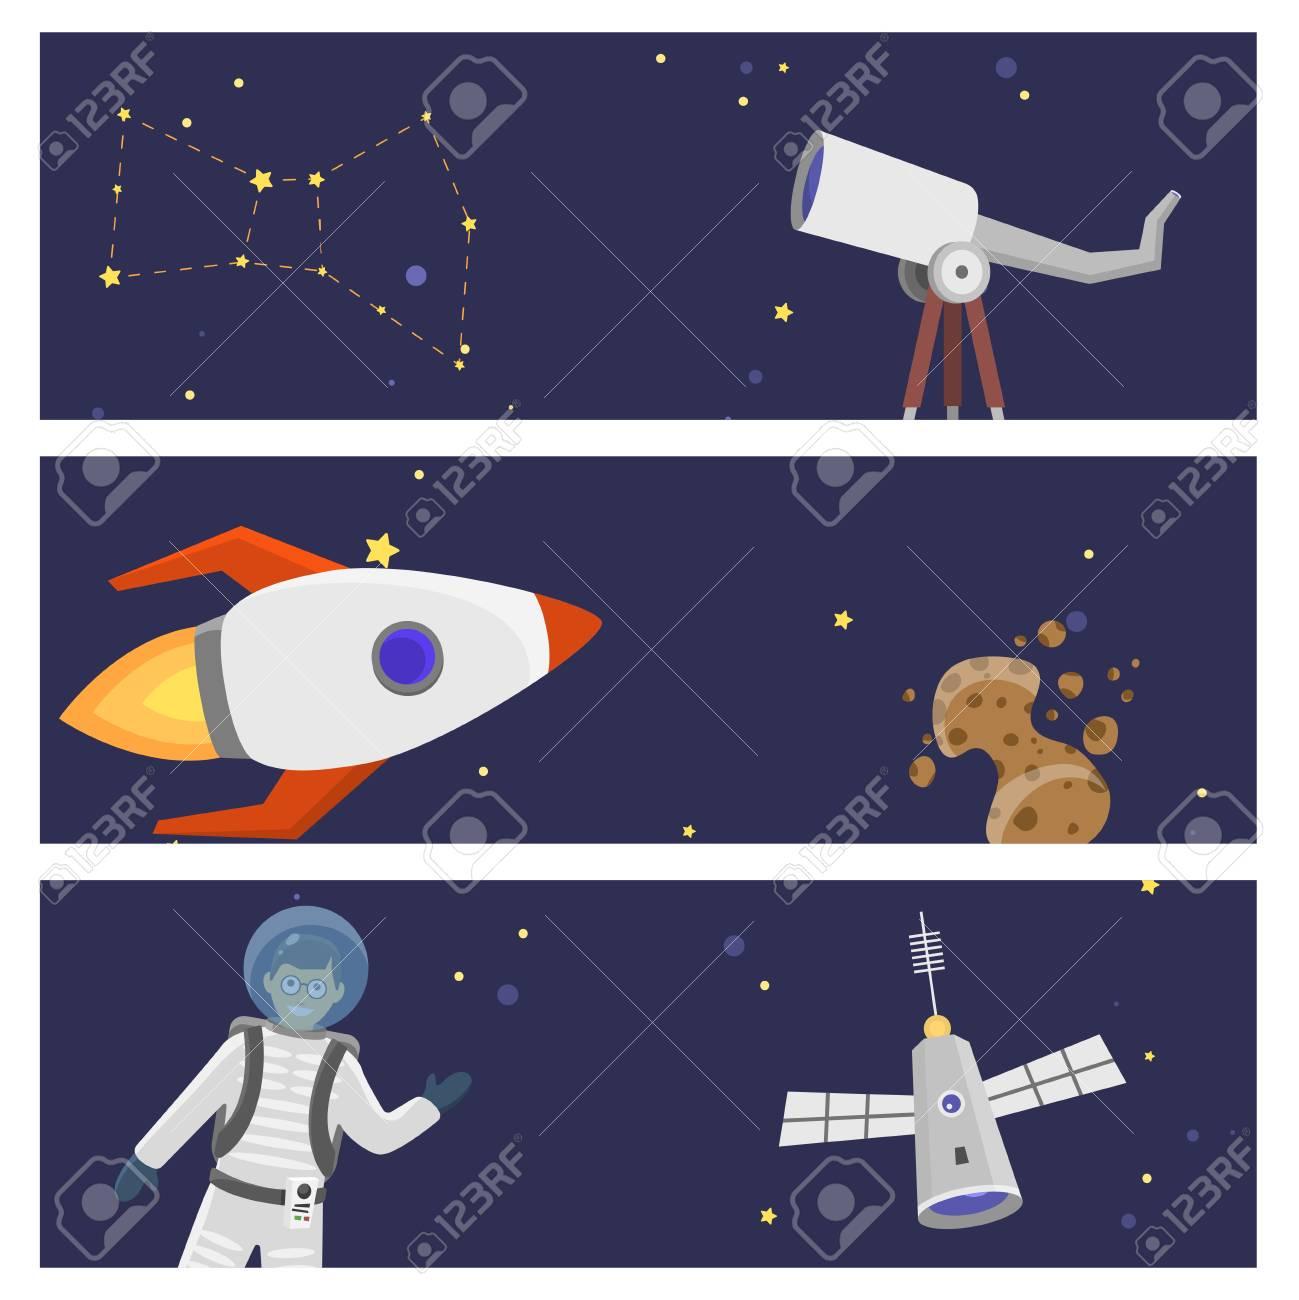 Astronaut Space Landing Card Design Future Exploration Space